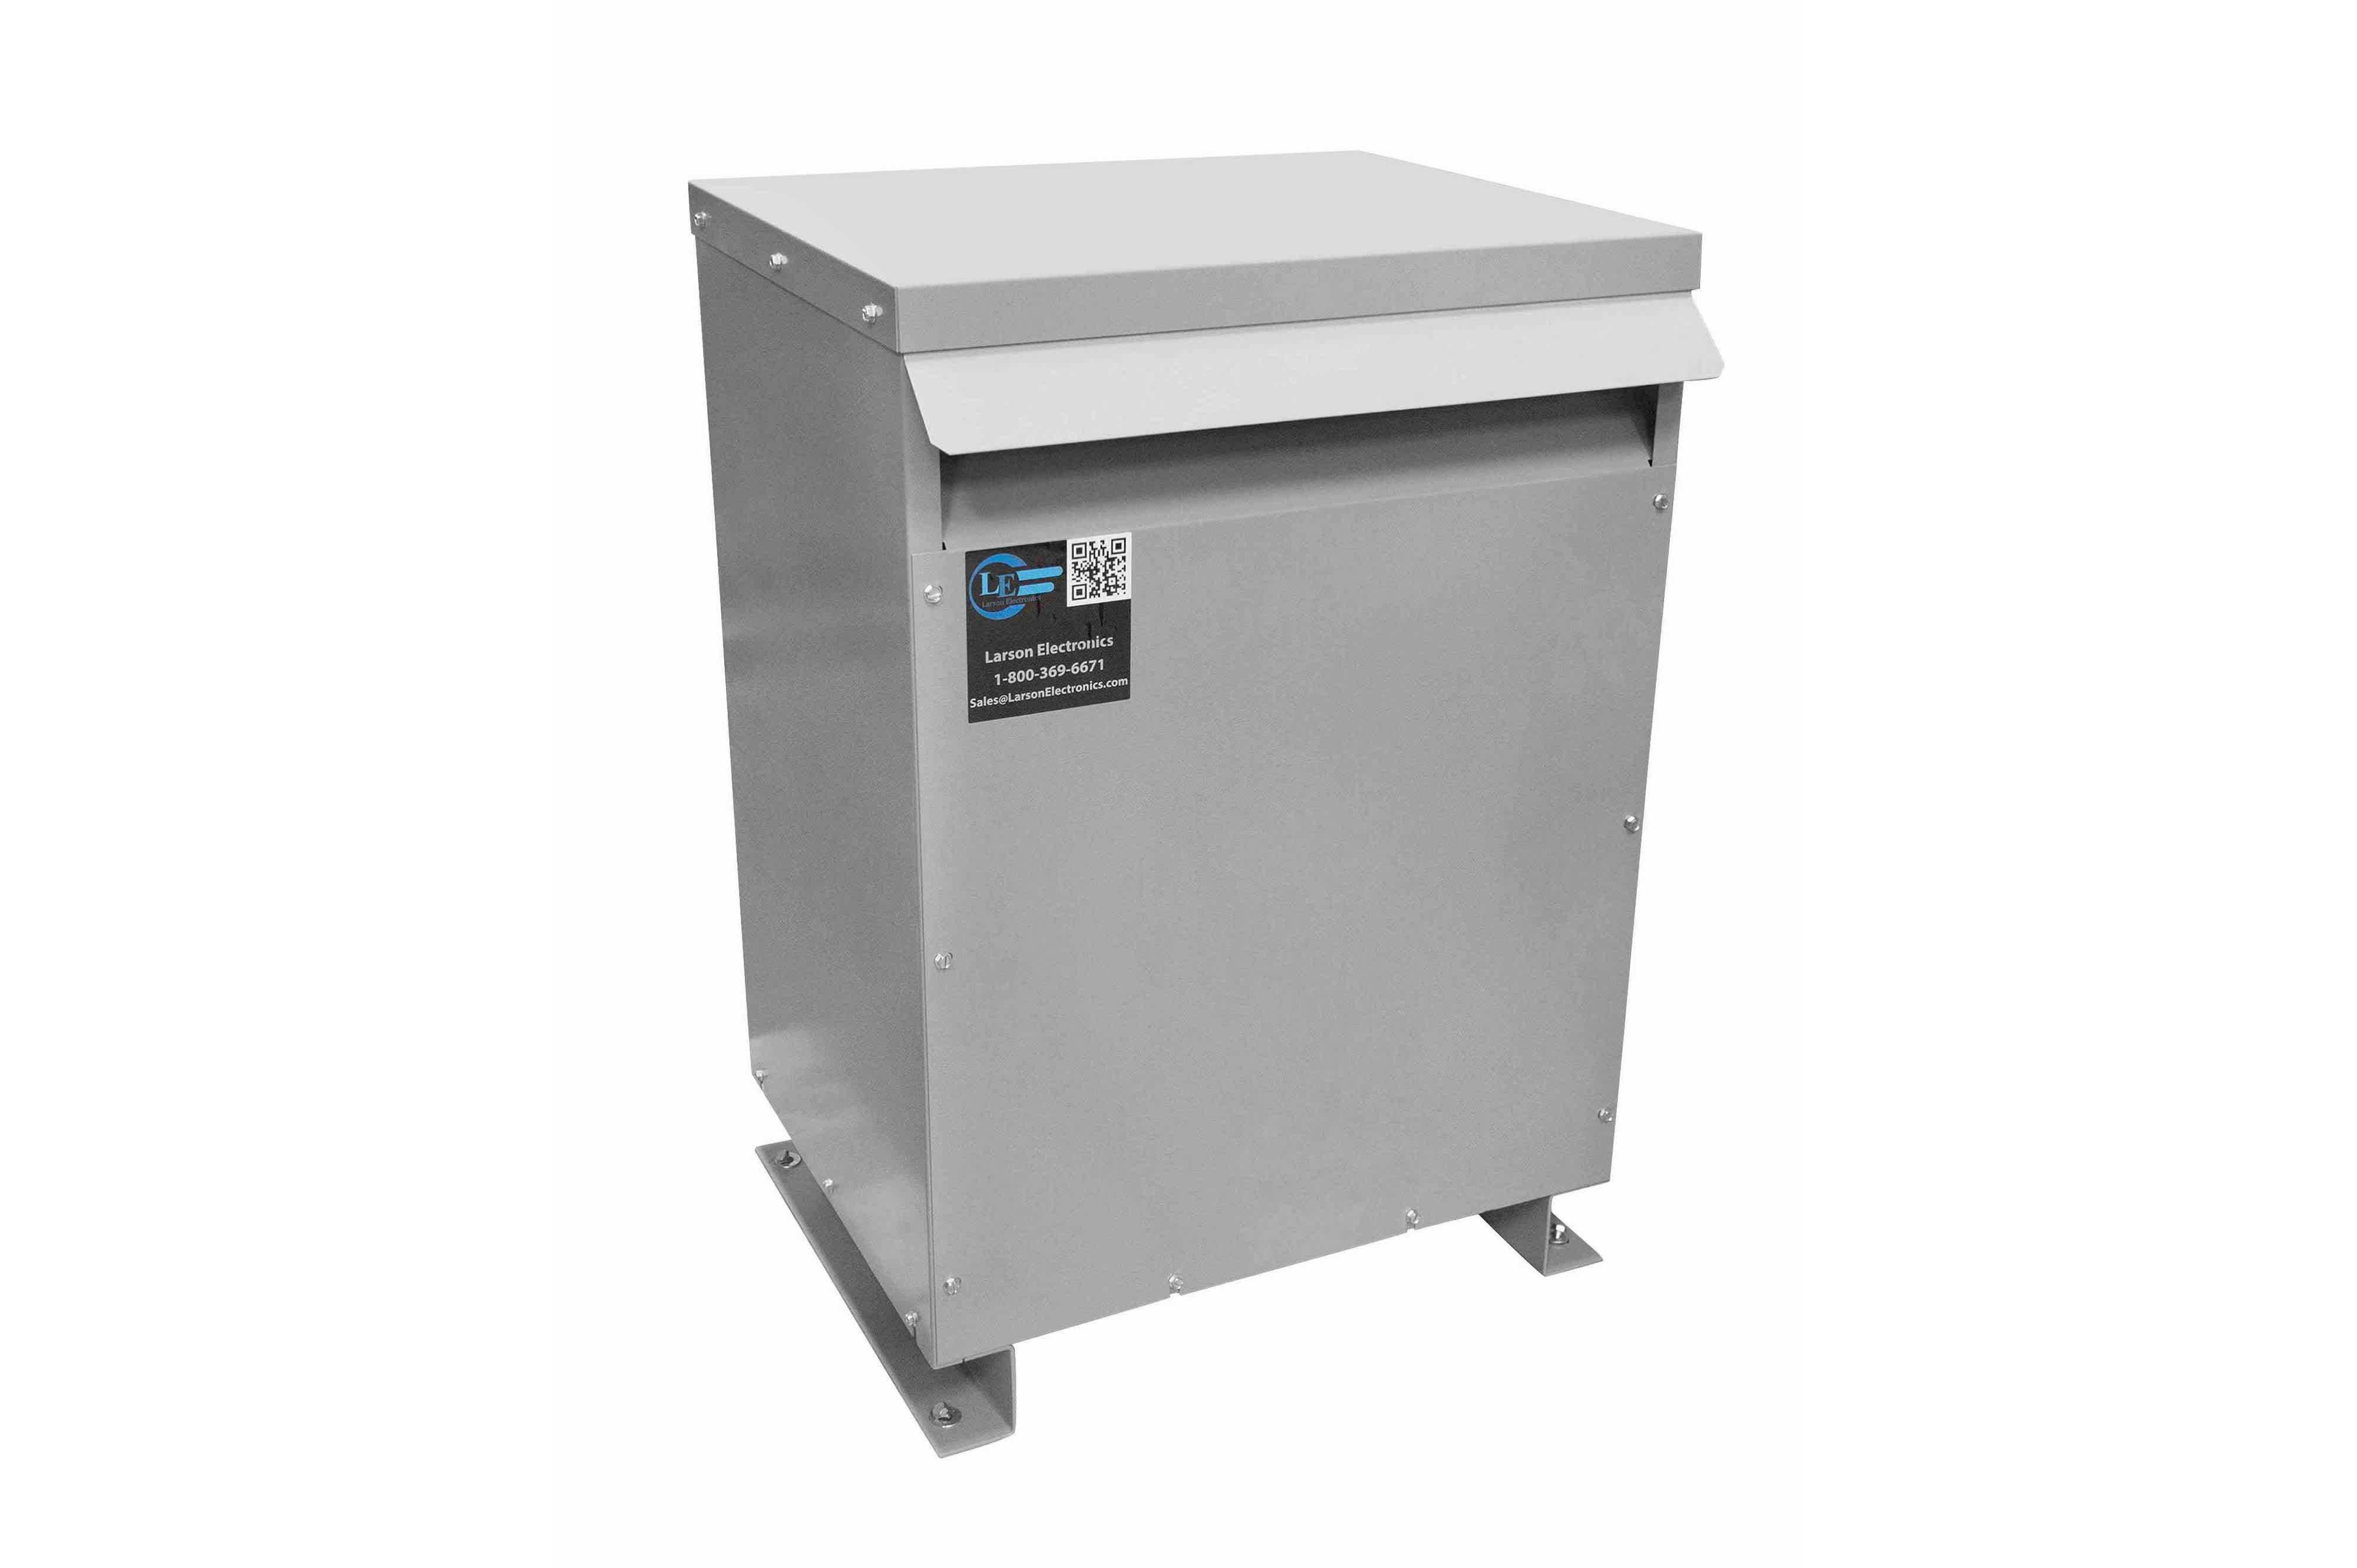 29 kVA 3PH Isolation Transformer, 380V Wye Primary, 600V Delta Secondary, N3R, Ventilated, 60 Hz